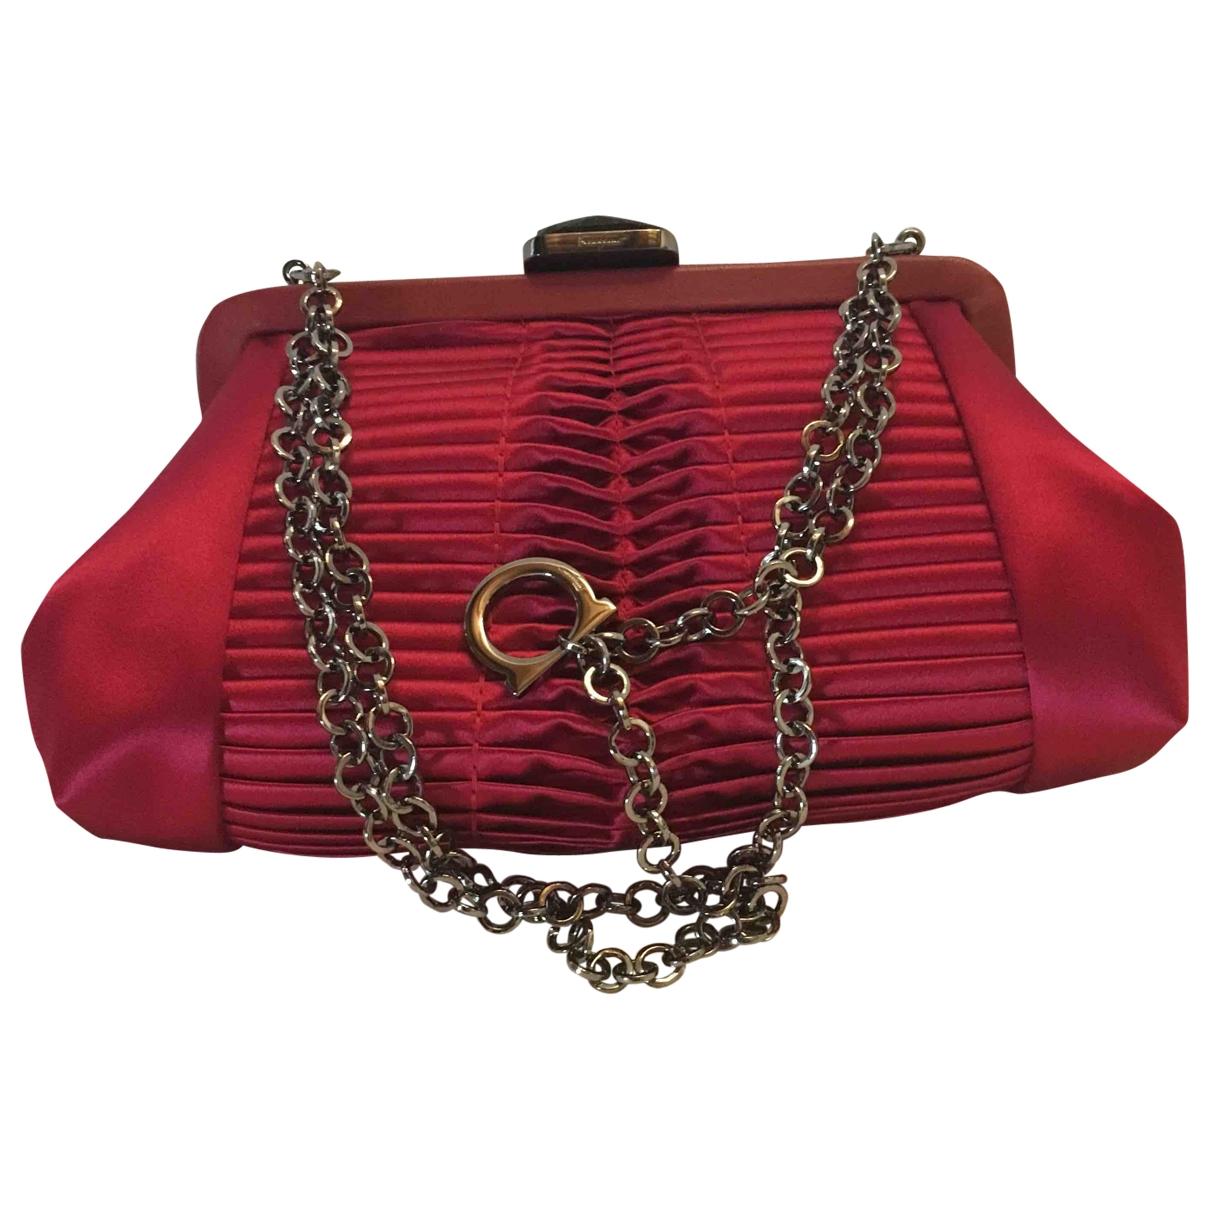 Salvatore Ferragamo \N Red Silk Clutch bag for Women \N